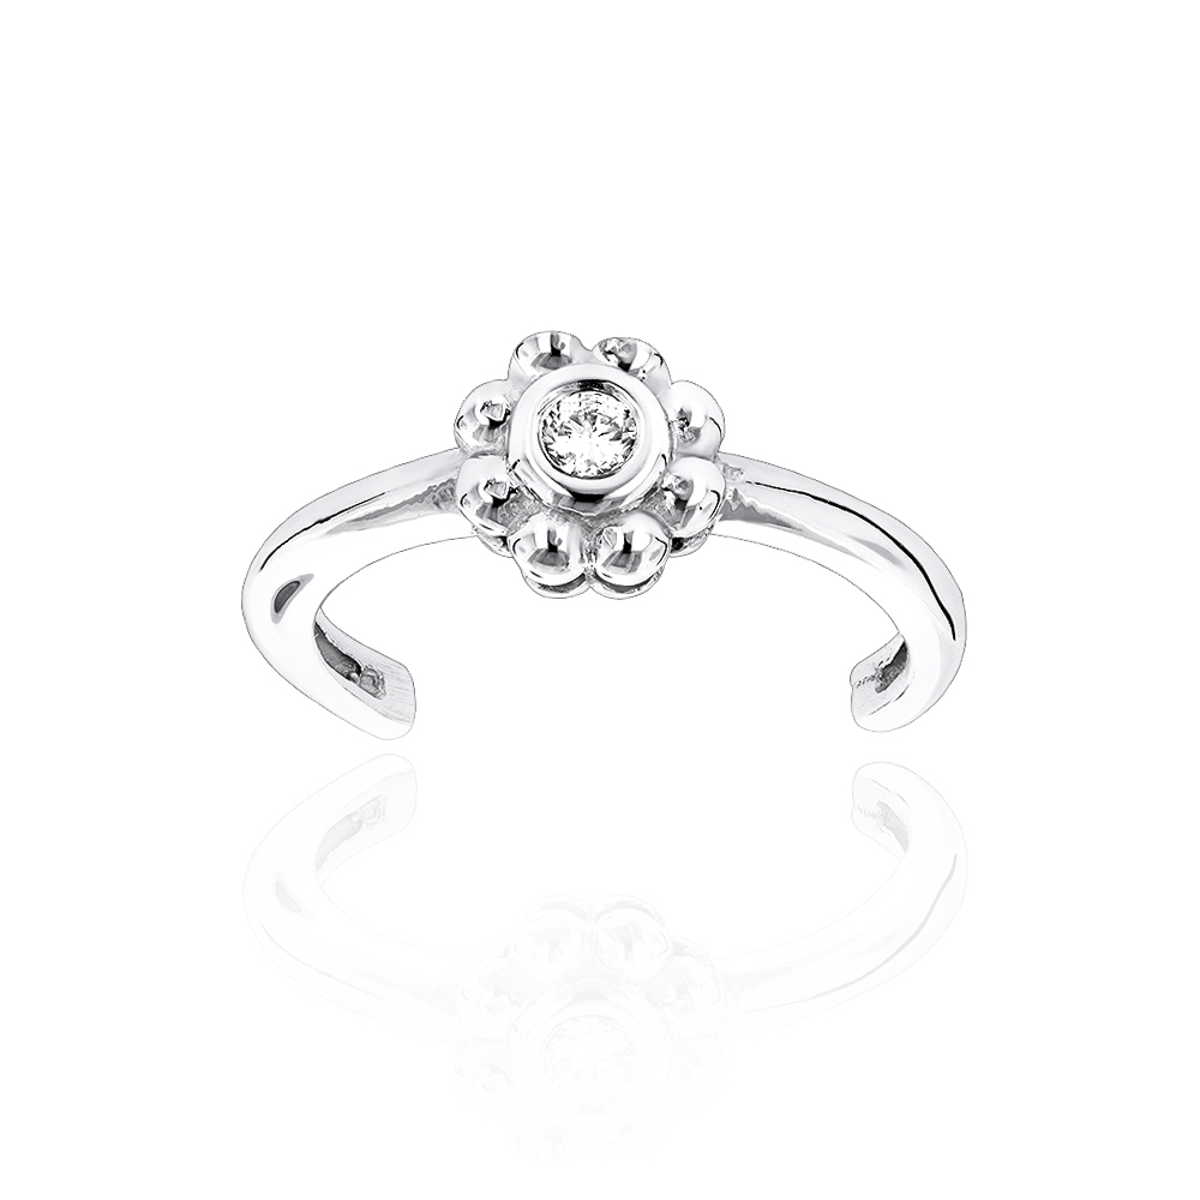 Adjustable 14K Gold Diamond Toe Ring Flower 0.06ct